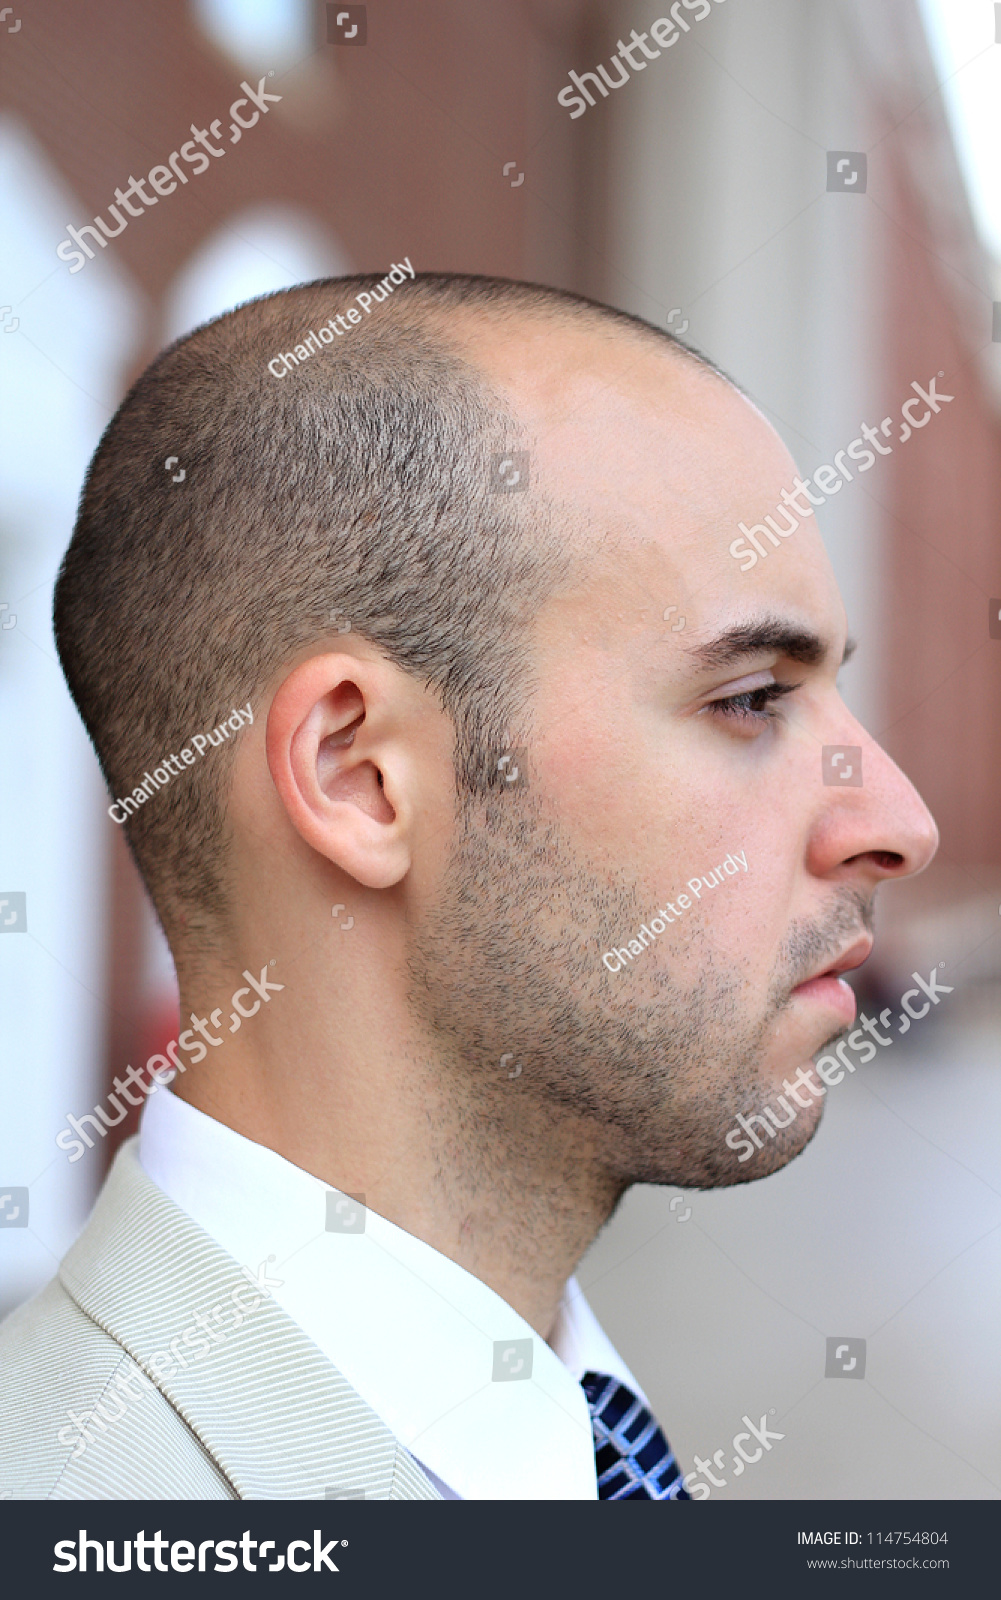 Side profile of man